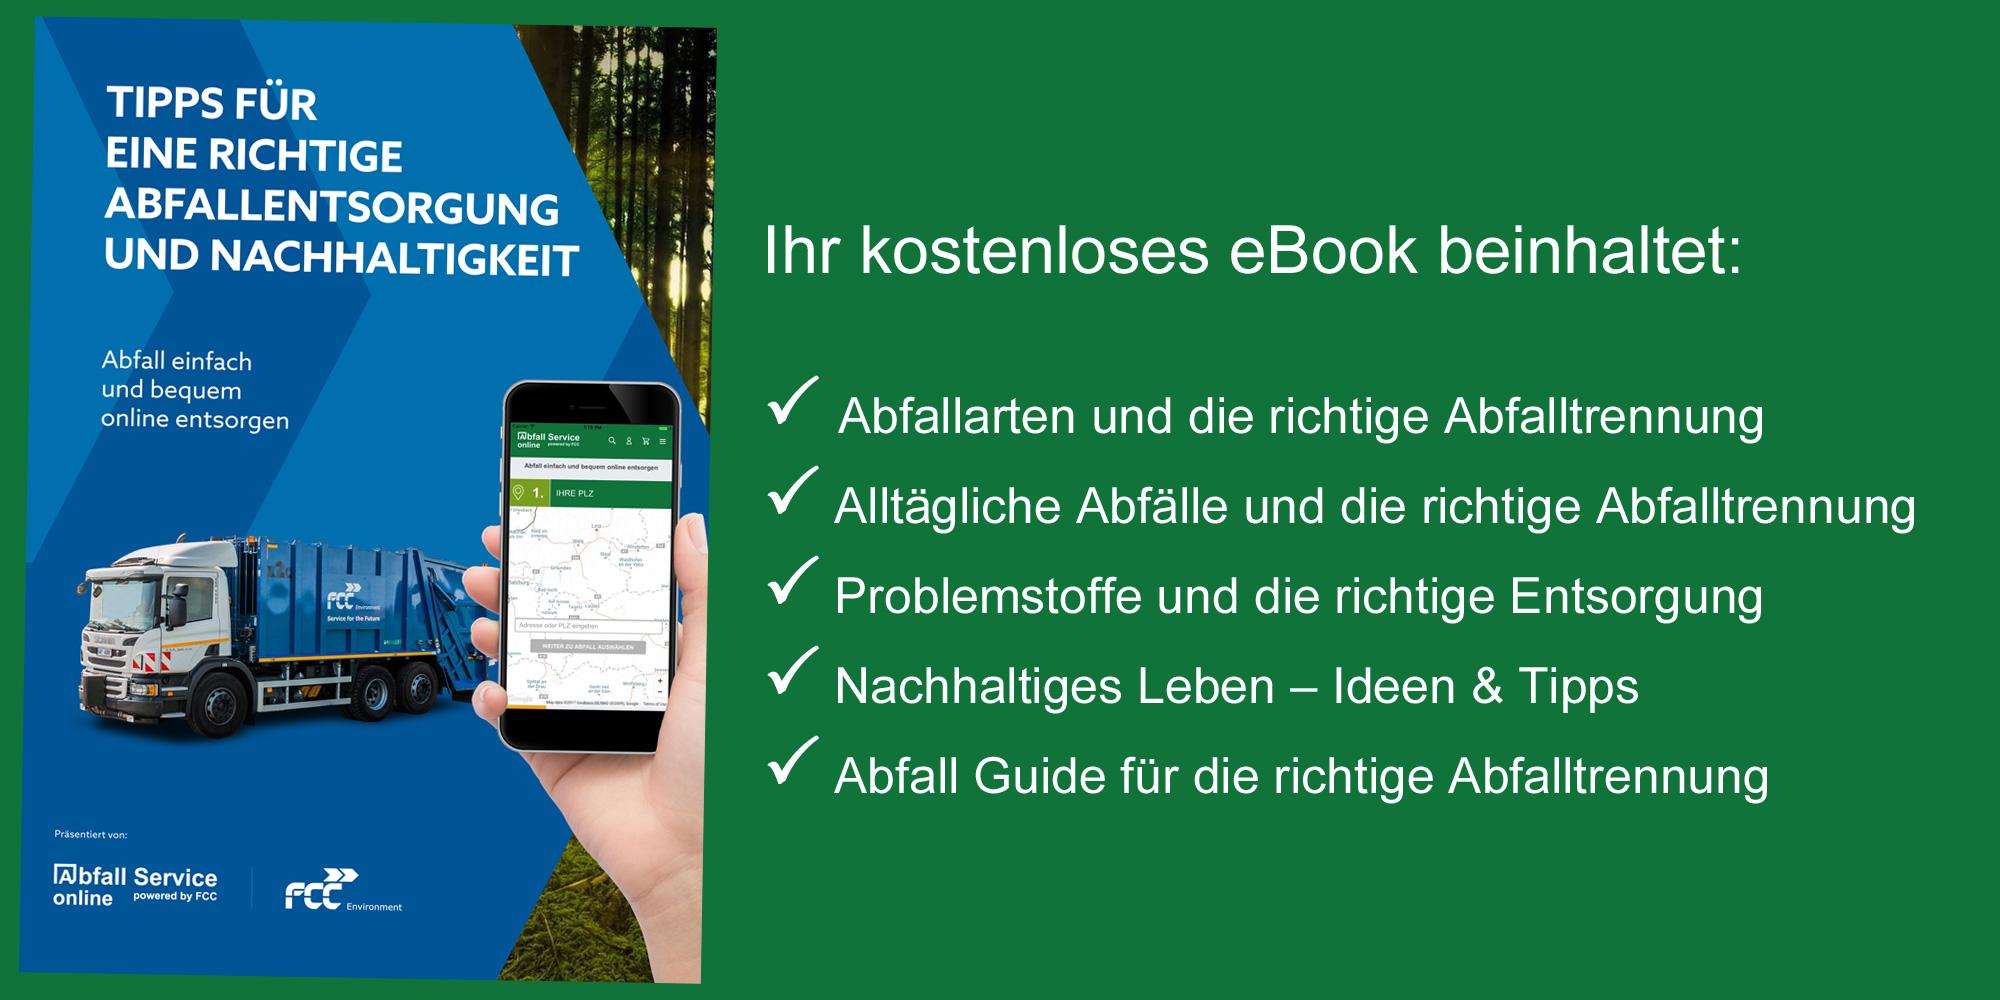 abfall-service-online-ebook-banner